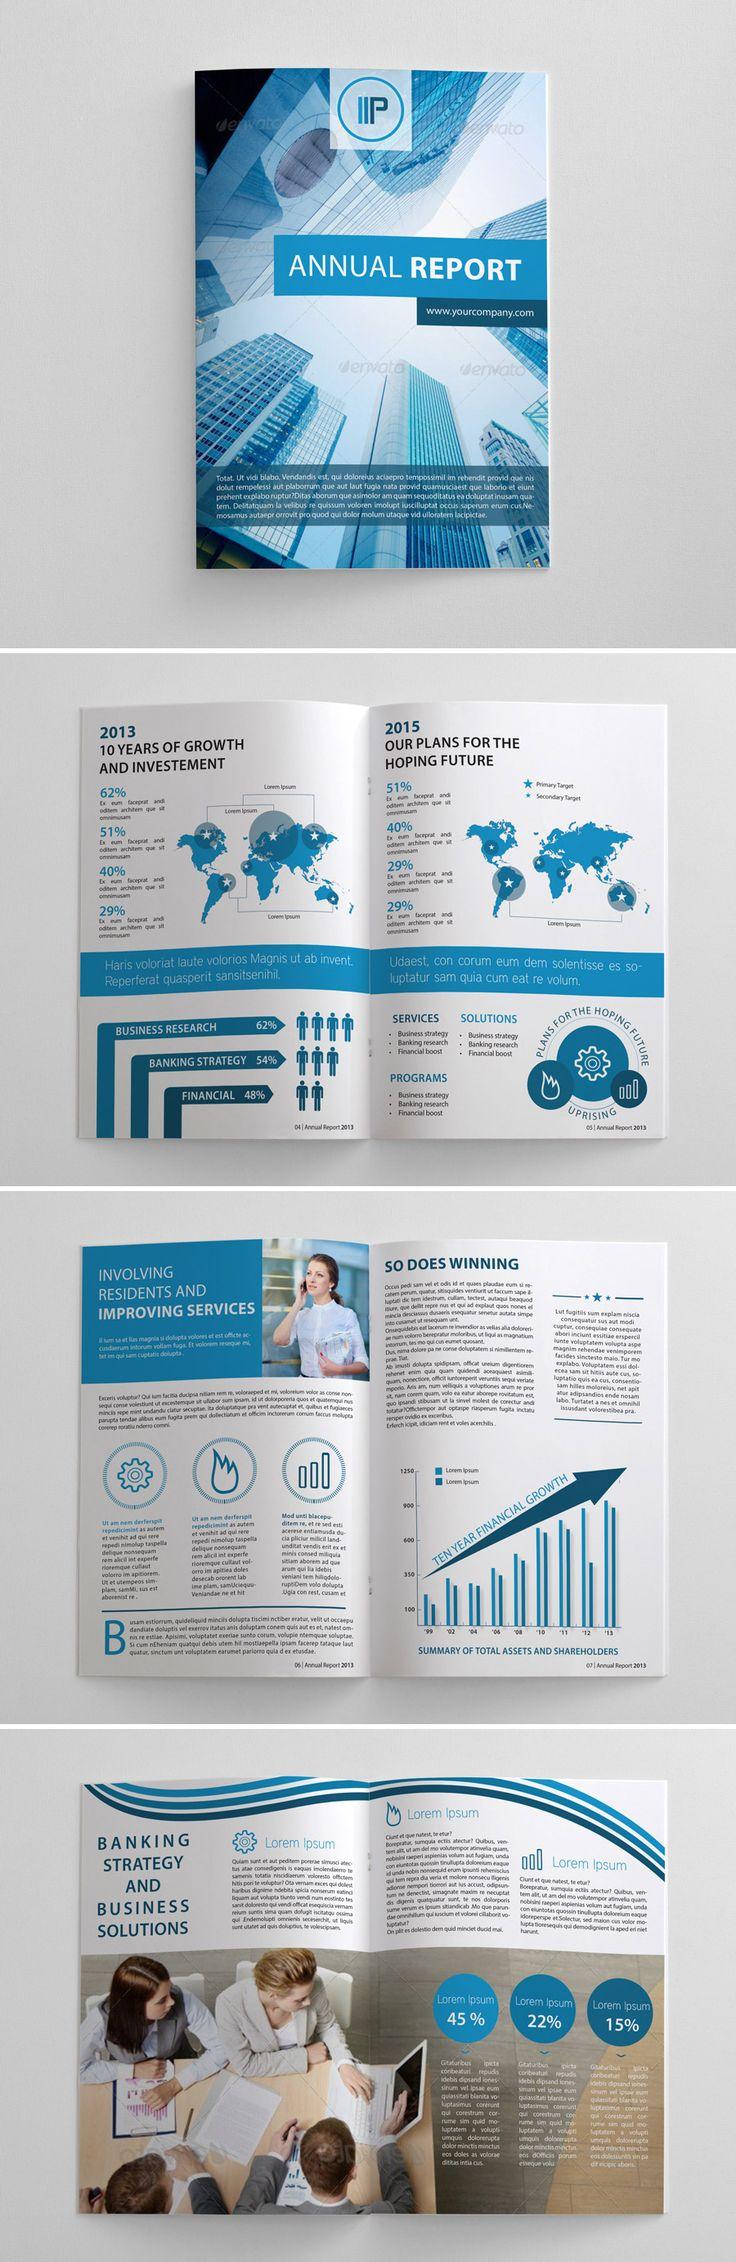 12-annual-report-brochure-design